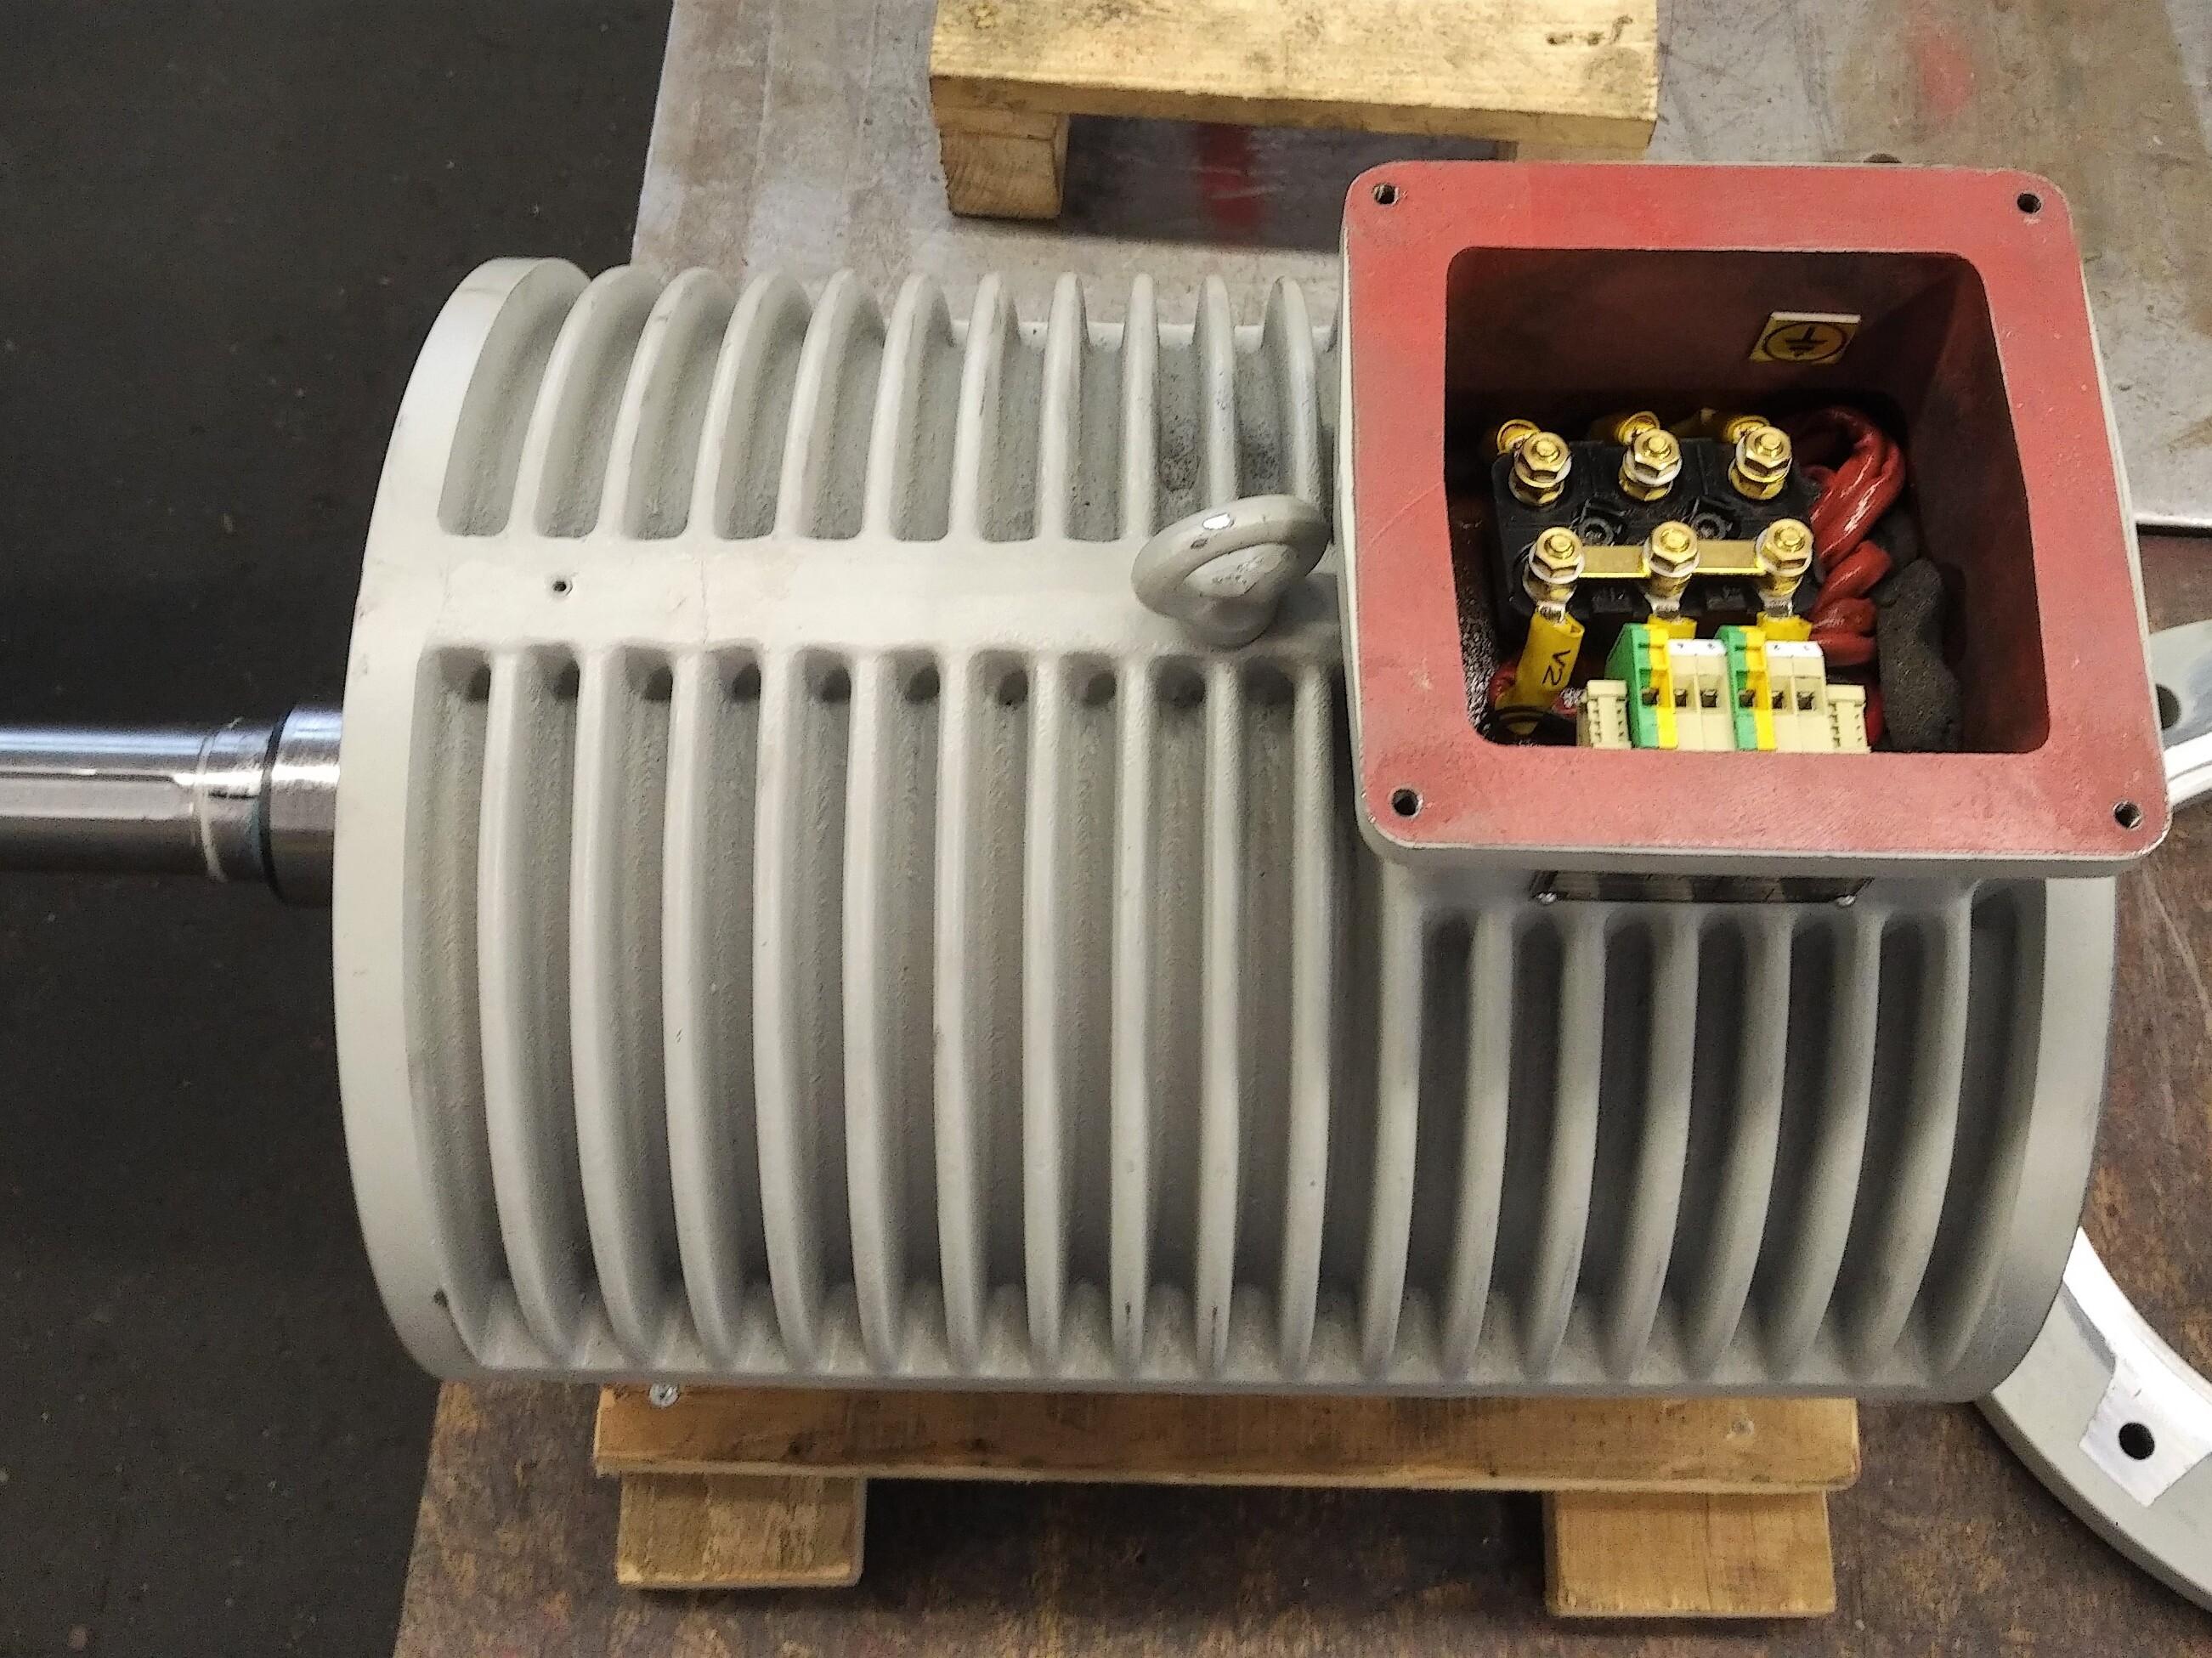 Three Phase Roller Table Motors Up To 1000 V Vem Motor Wiring Diagram Stator For